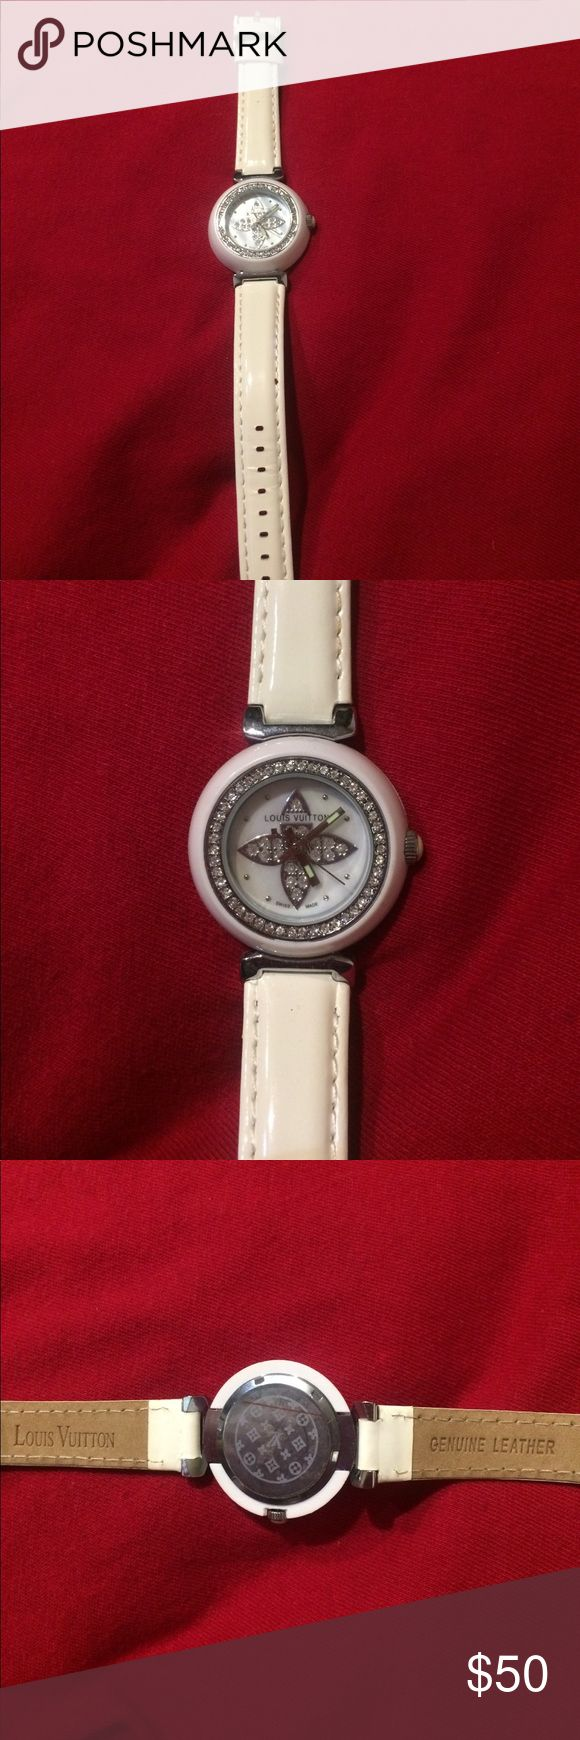 Louis Vuitton watch LV white watch Jewelry